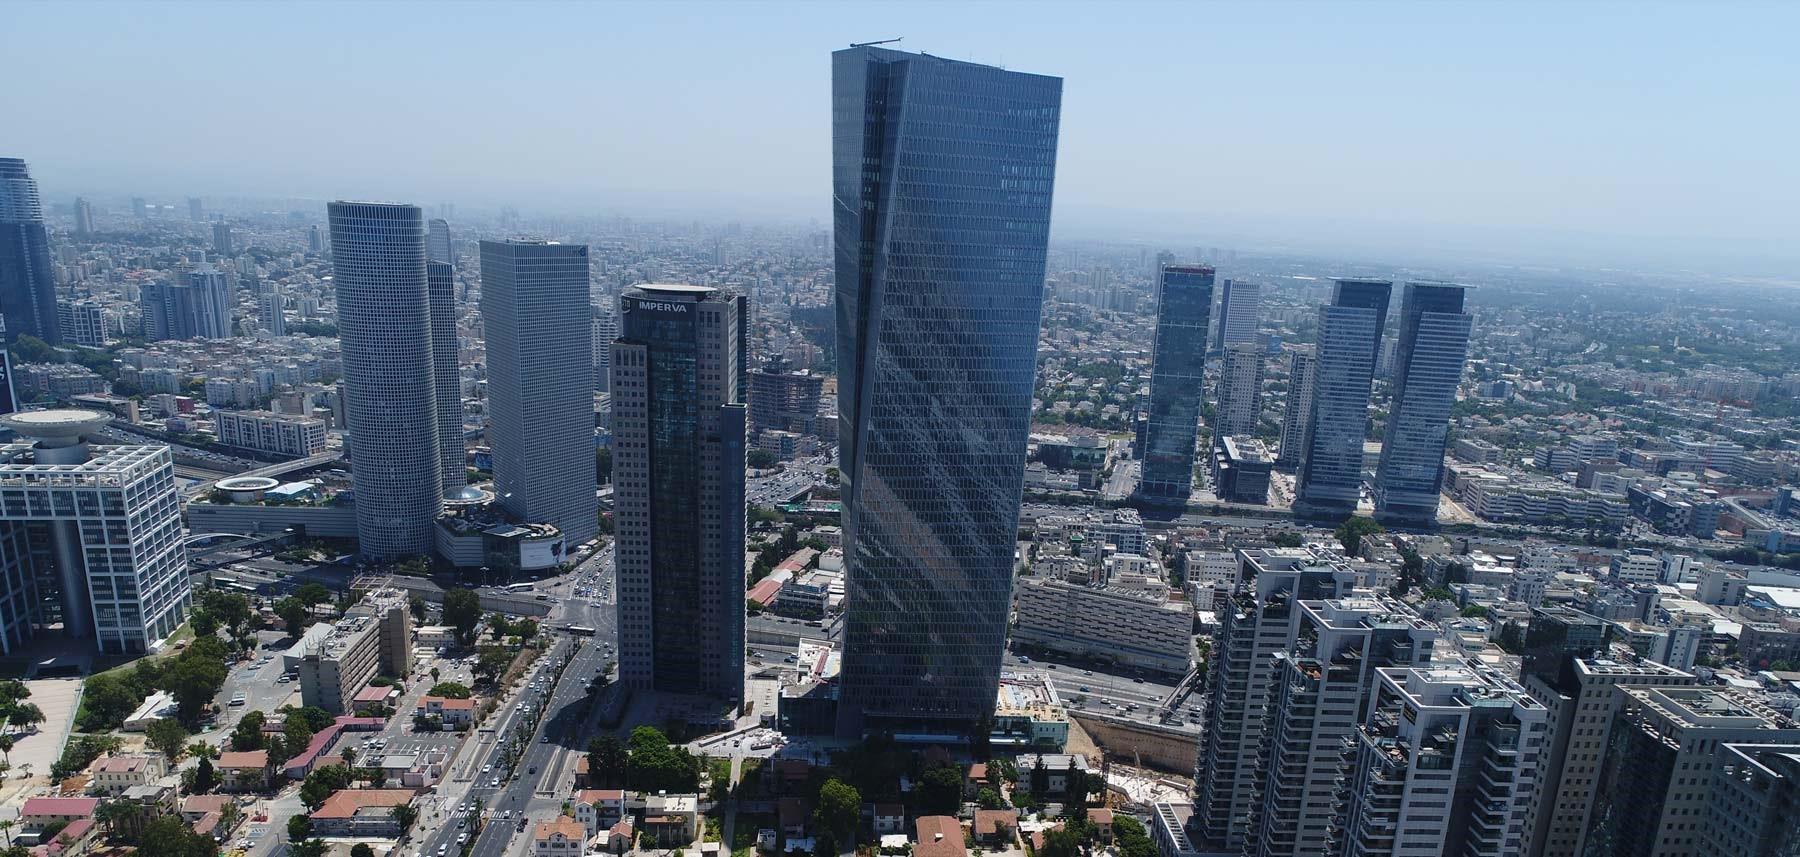 Azrieli Sarona Tower in Tel Aviv (Israel) where Apple would open a store